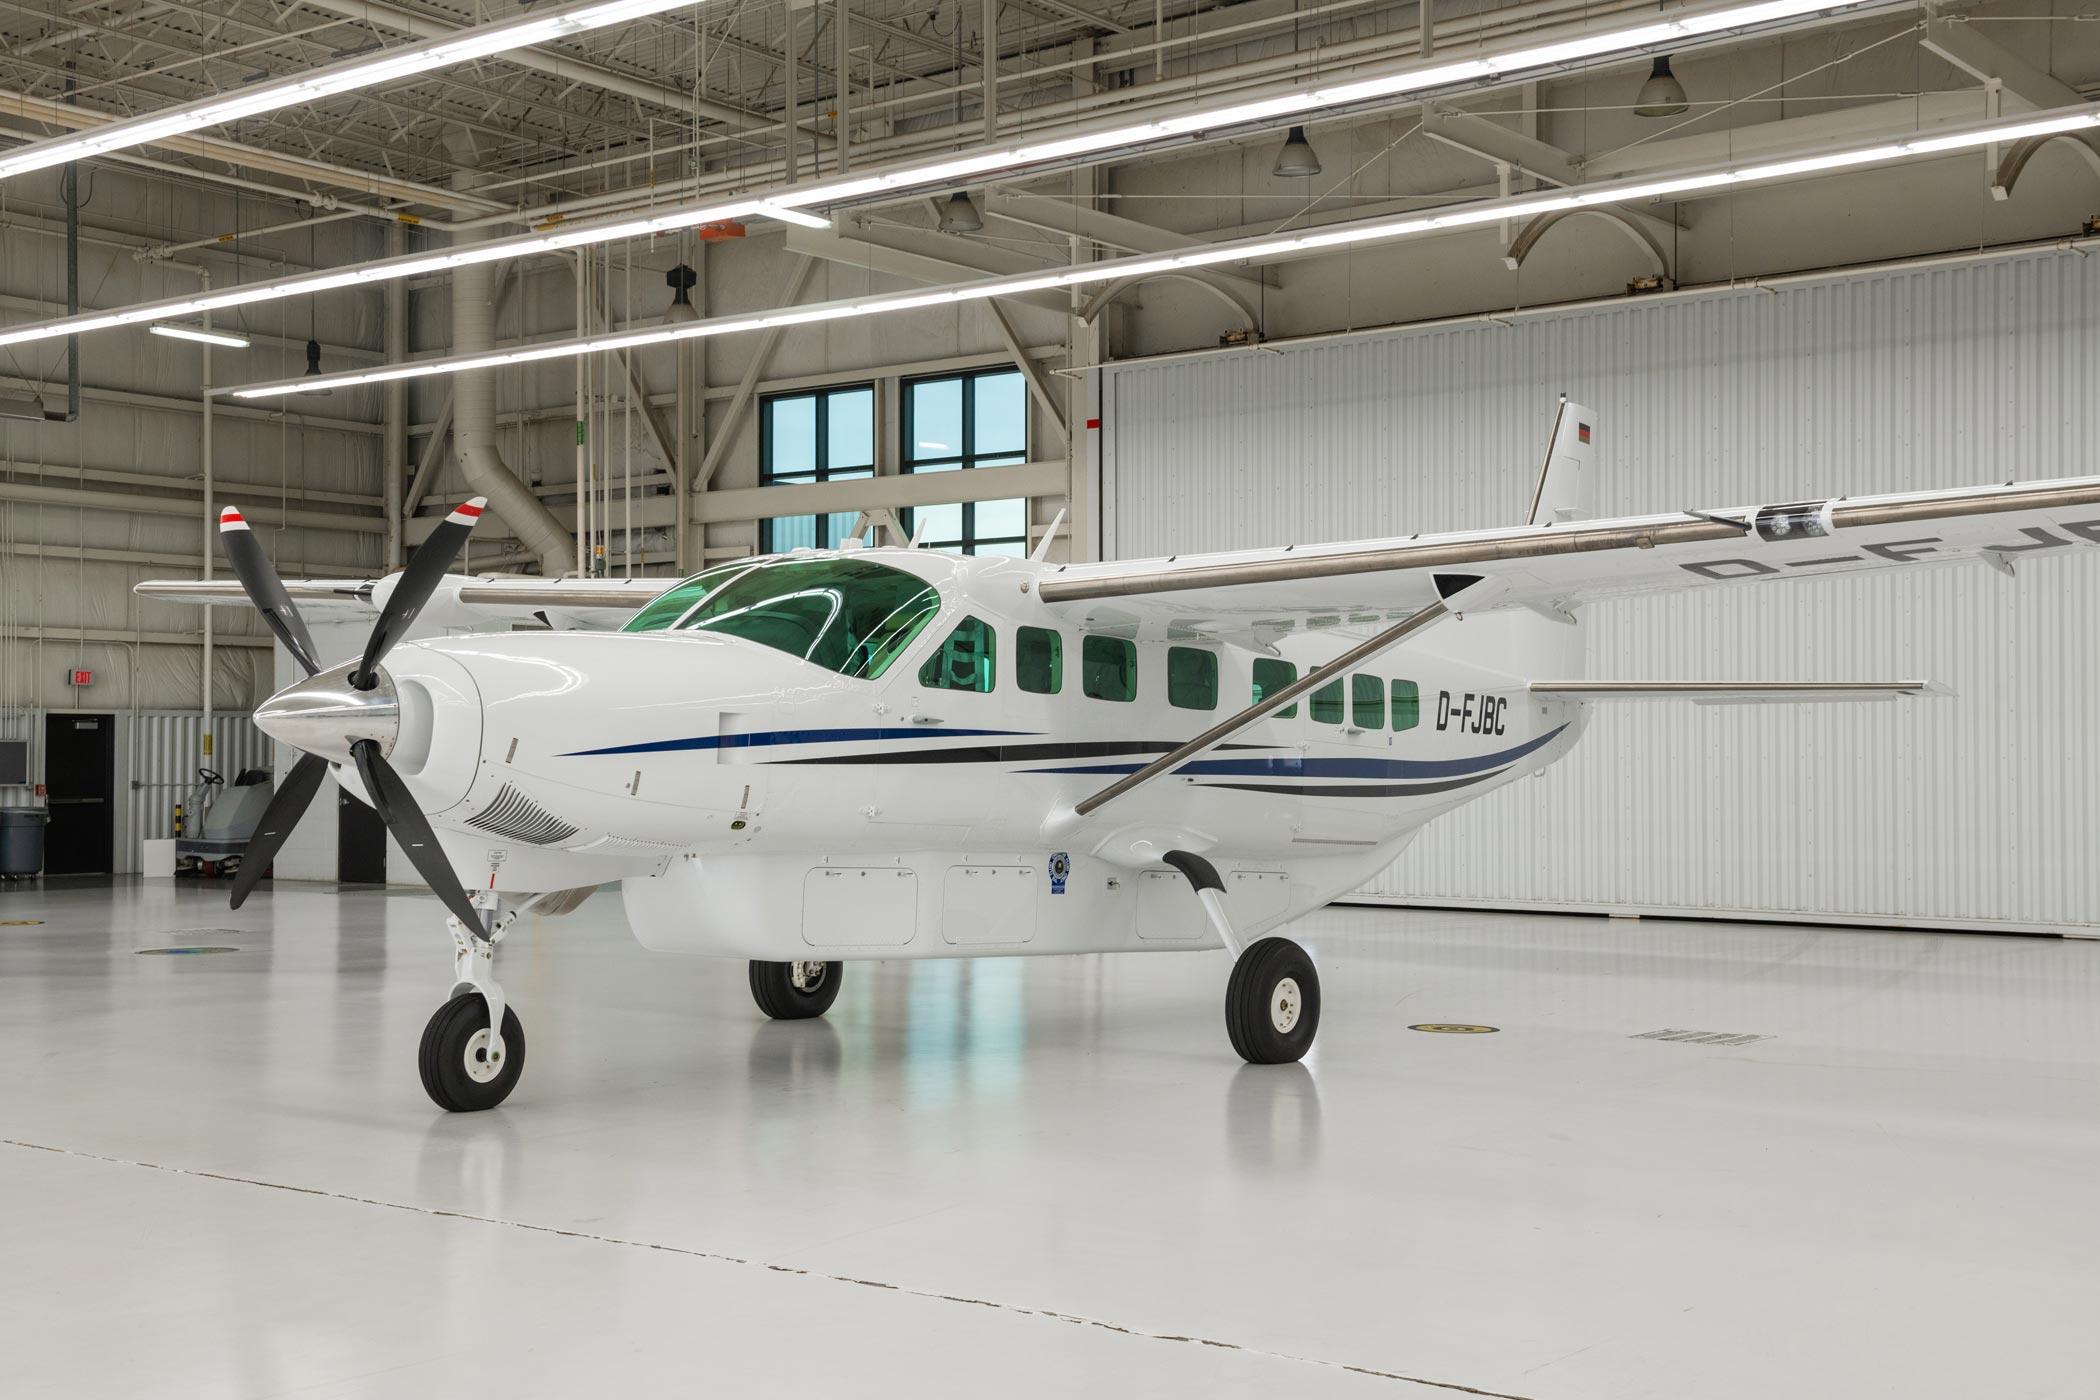 2018 Cessna Grand Caravan 208 For Sale